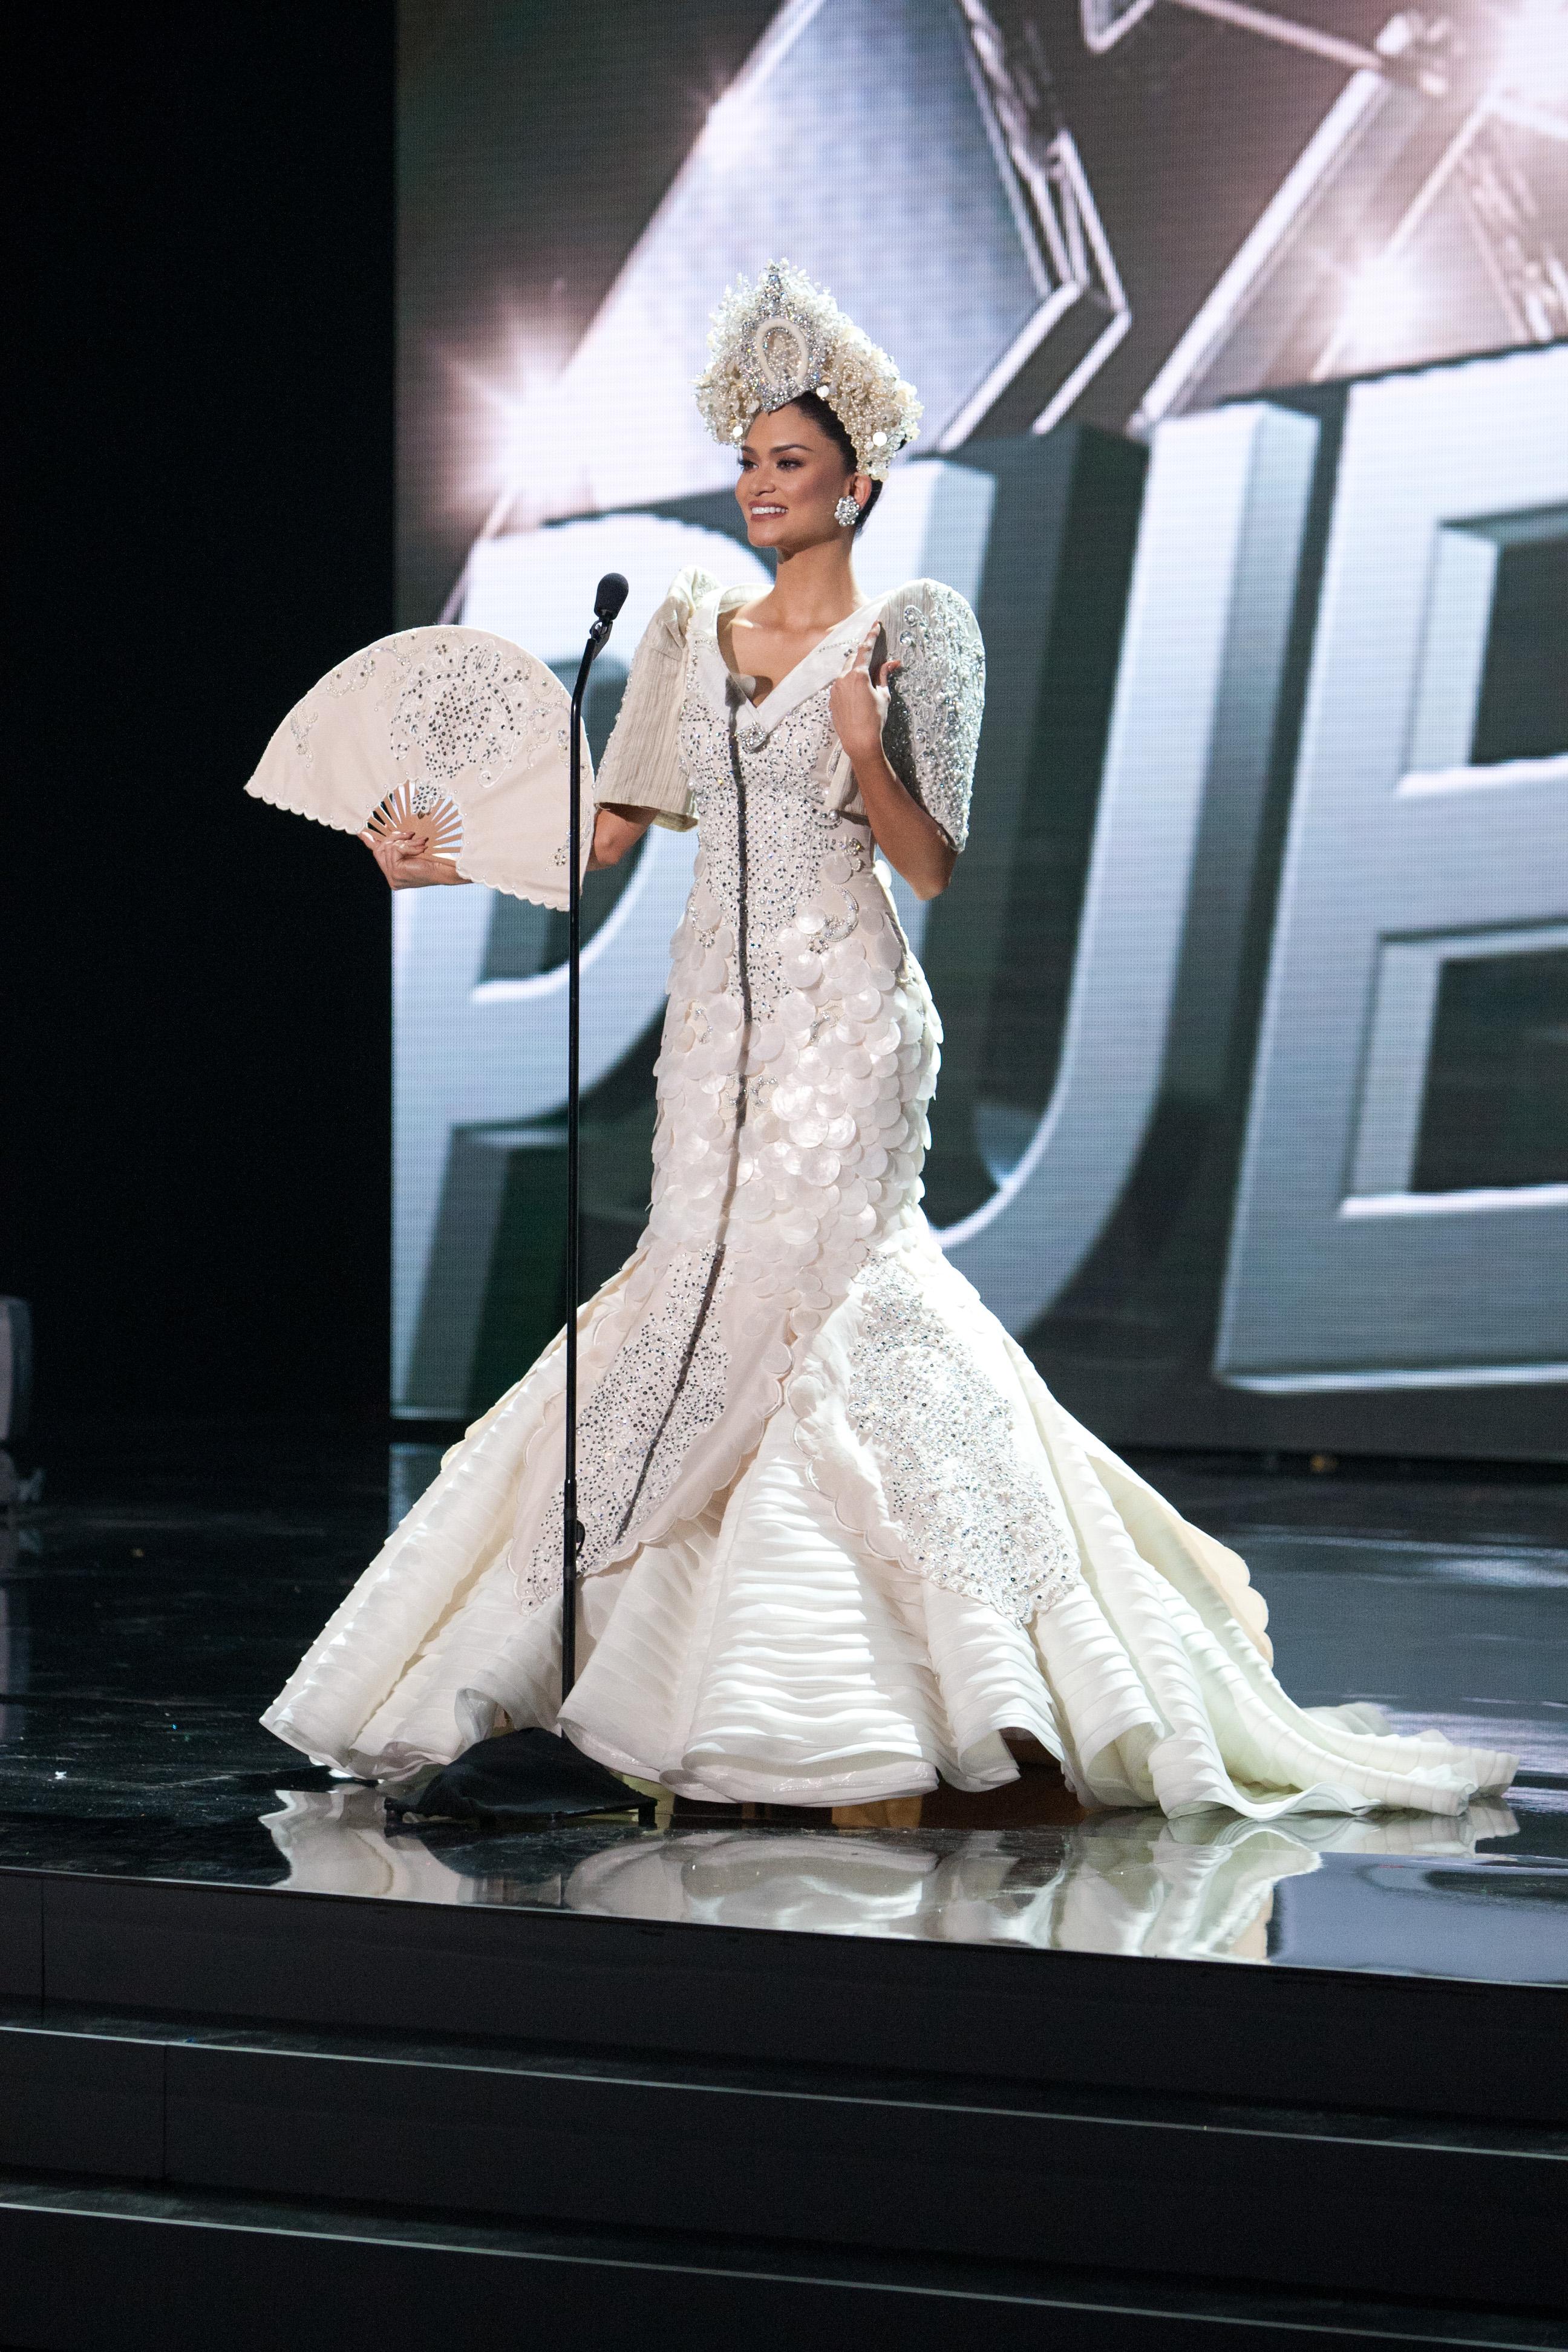 LOOK: Miss Universe PH 2015 Pia Wurtzbach's national costume